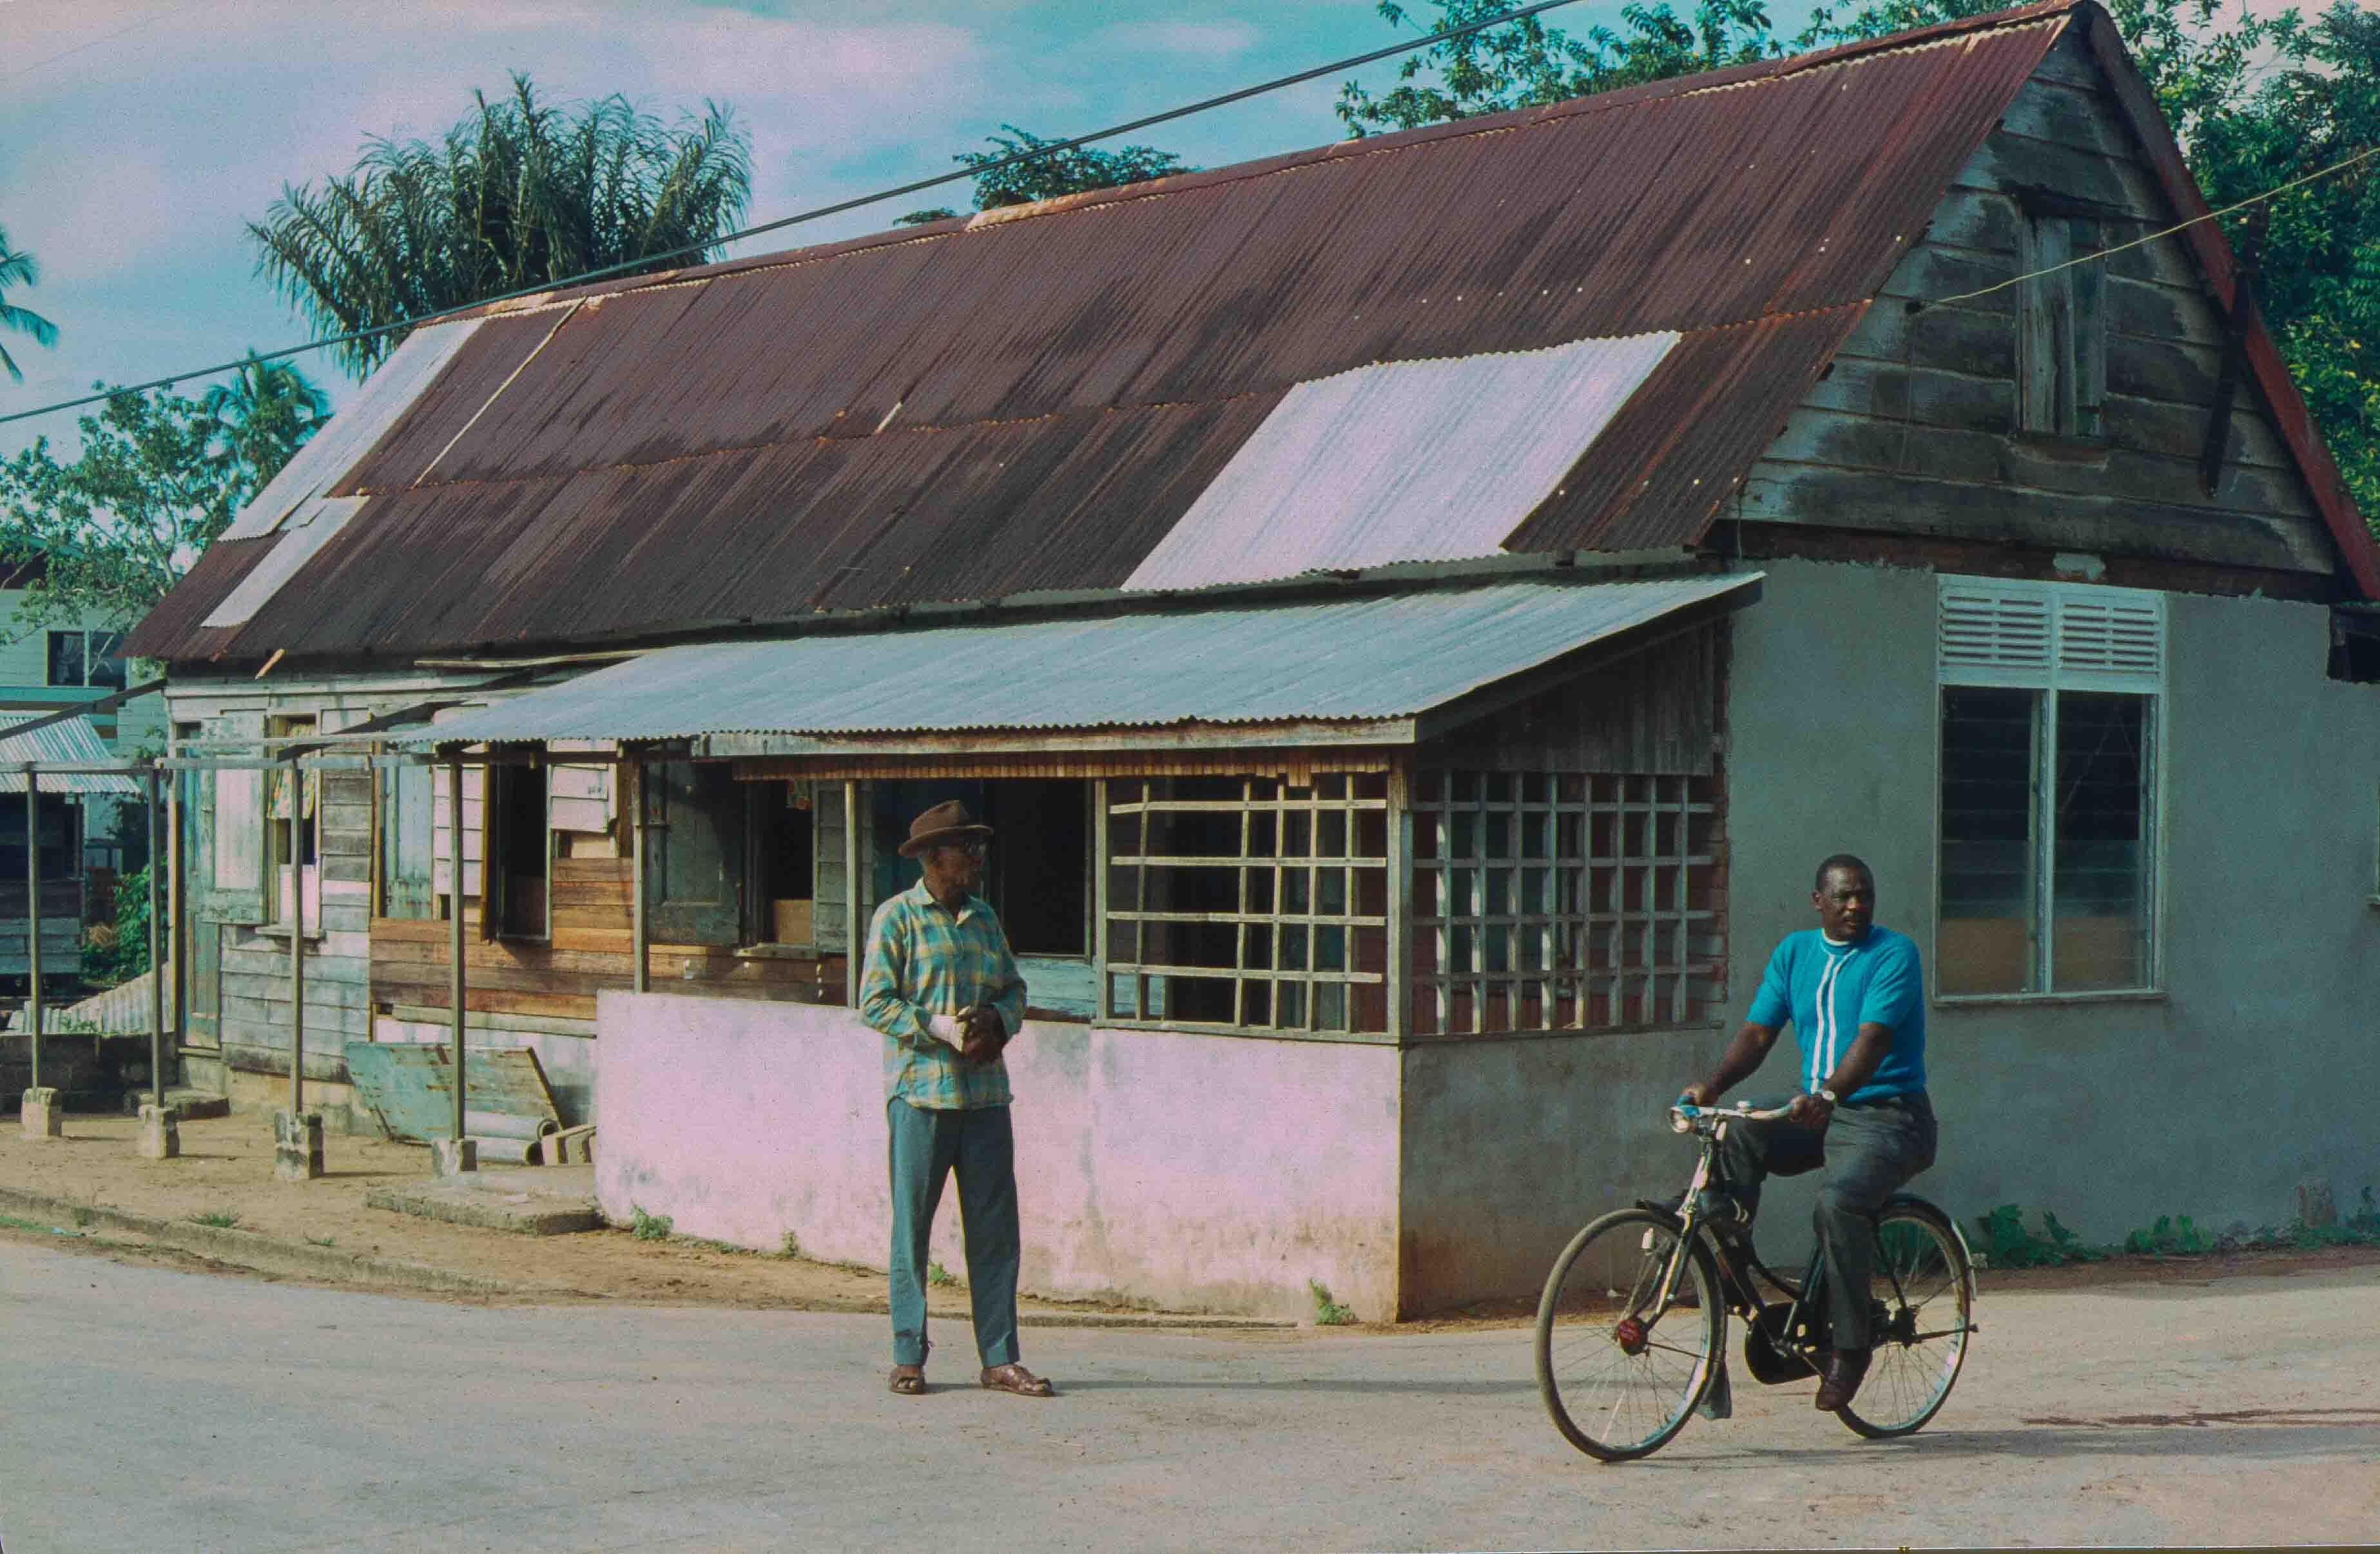 386. Suriname